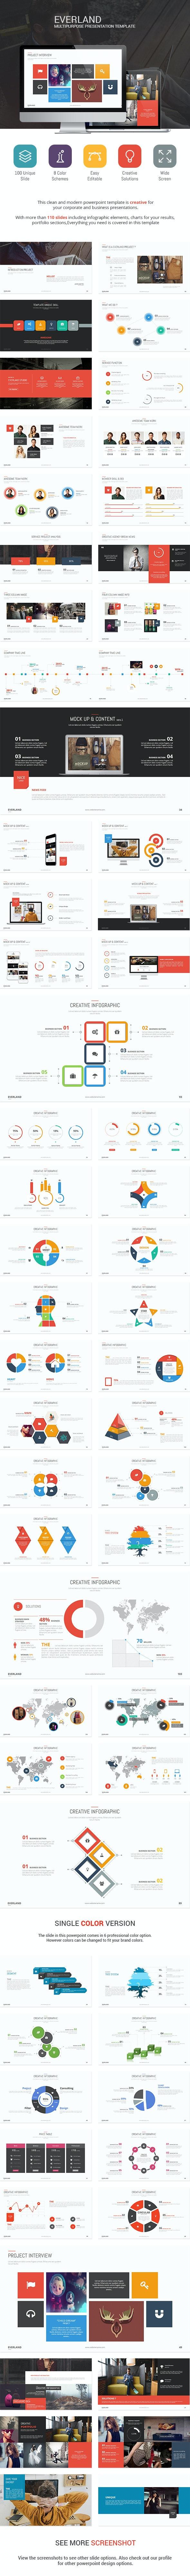 Everland - Multipurpose Template - Creative PowerPoint Templates